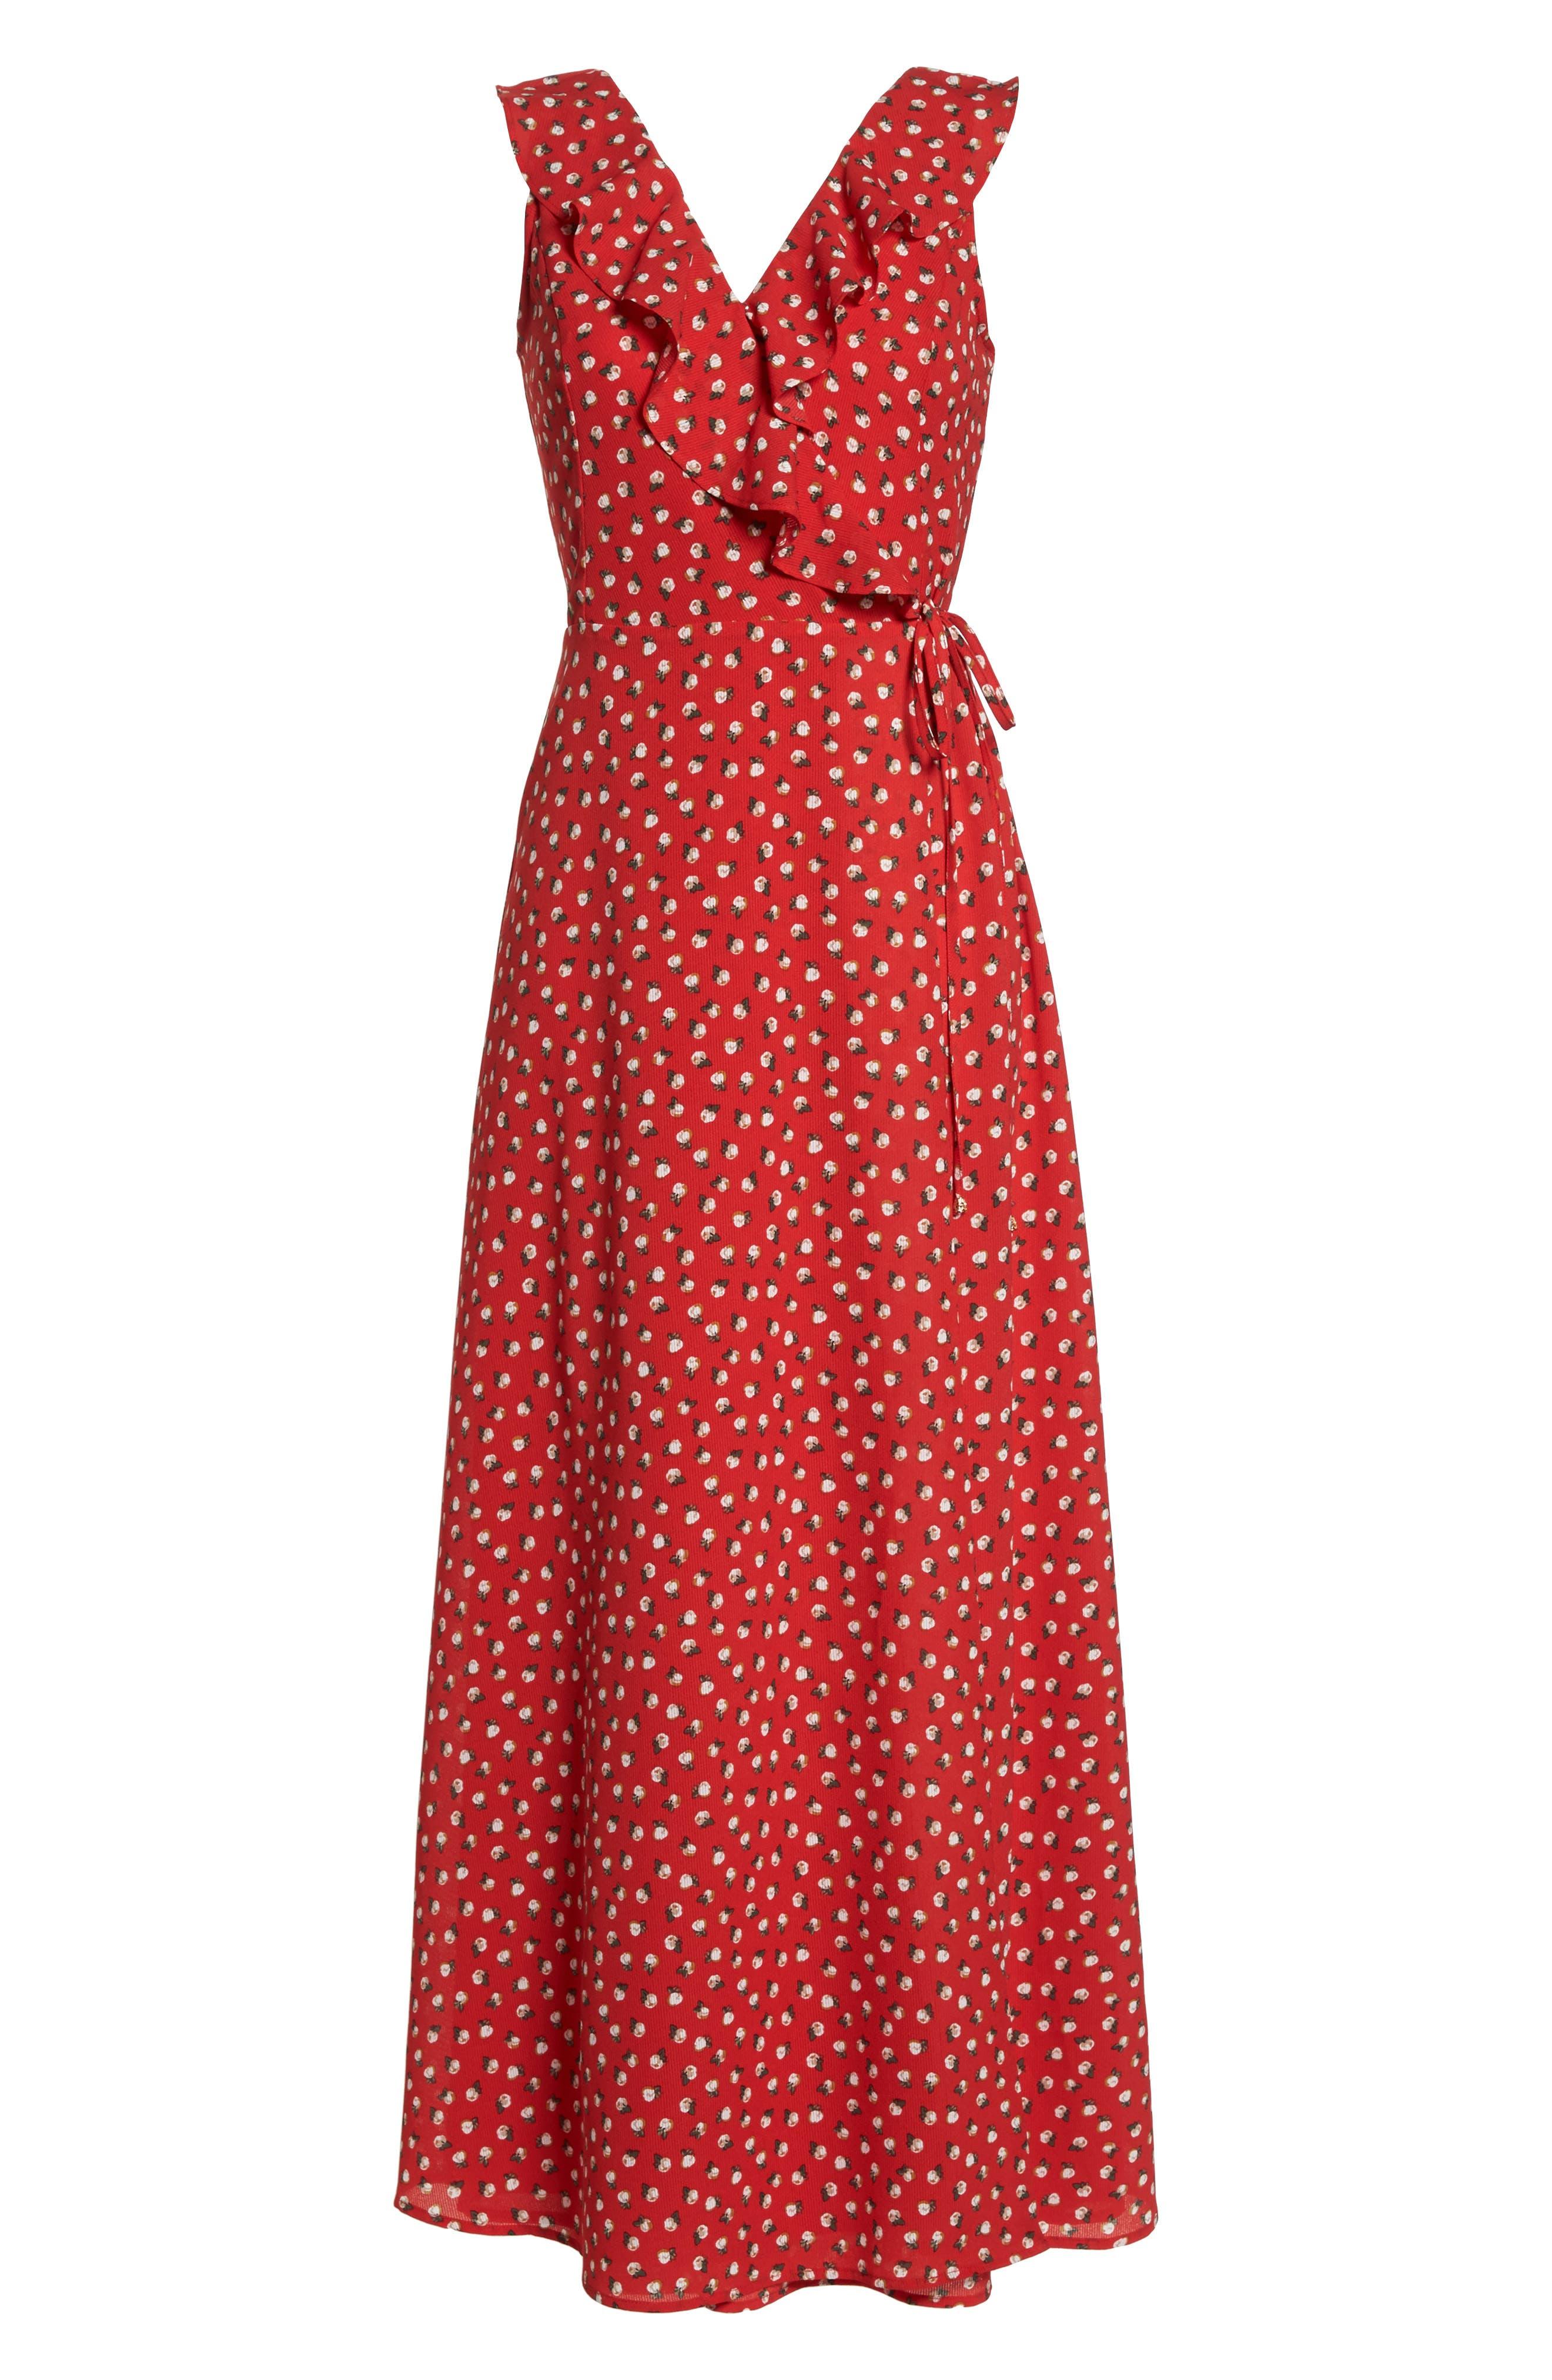 Nora Maxi Dress,                             Alternate thumbnail 7, color,                             Cherry